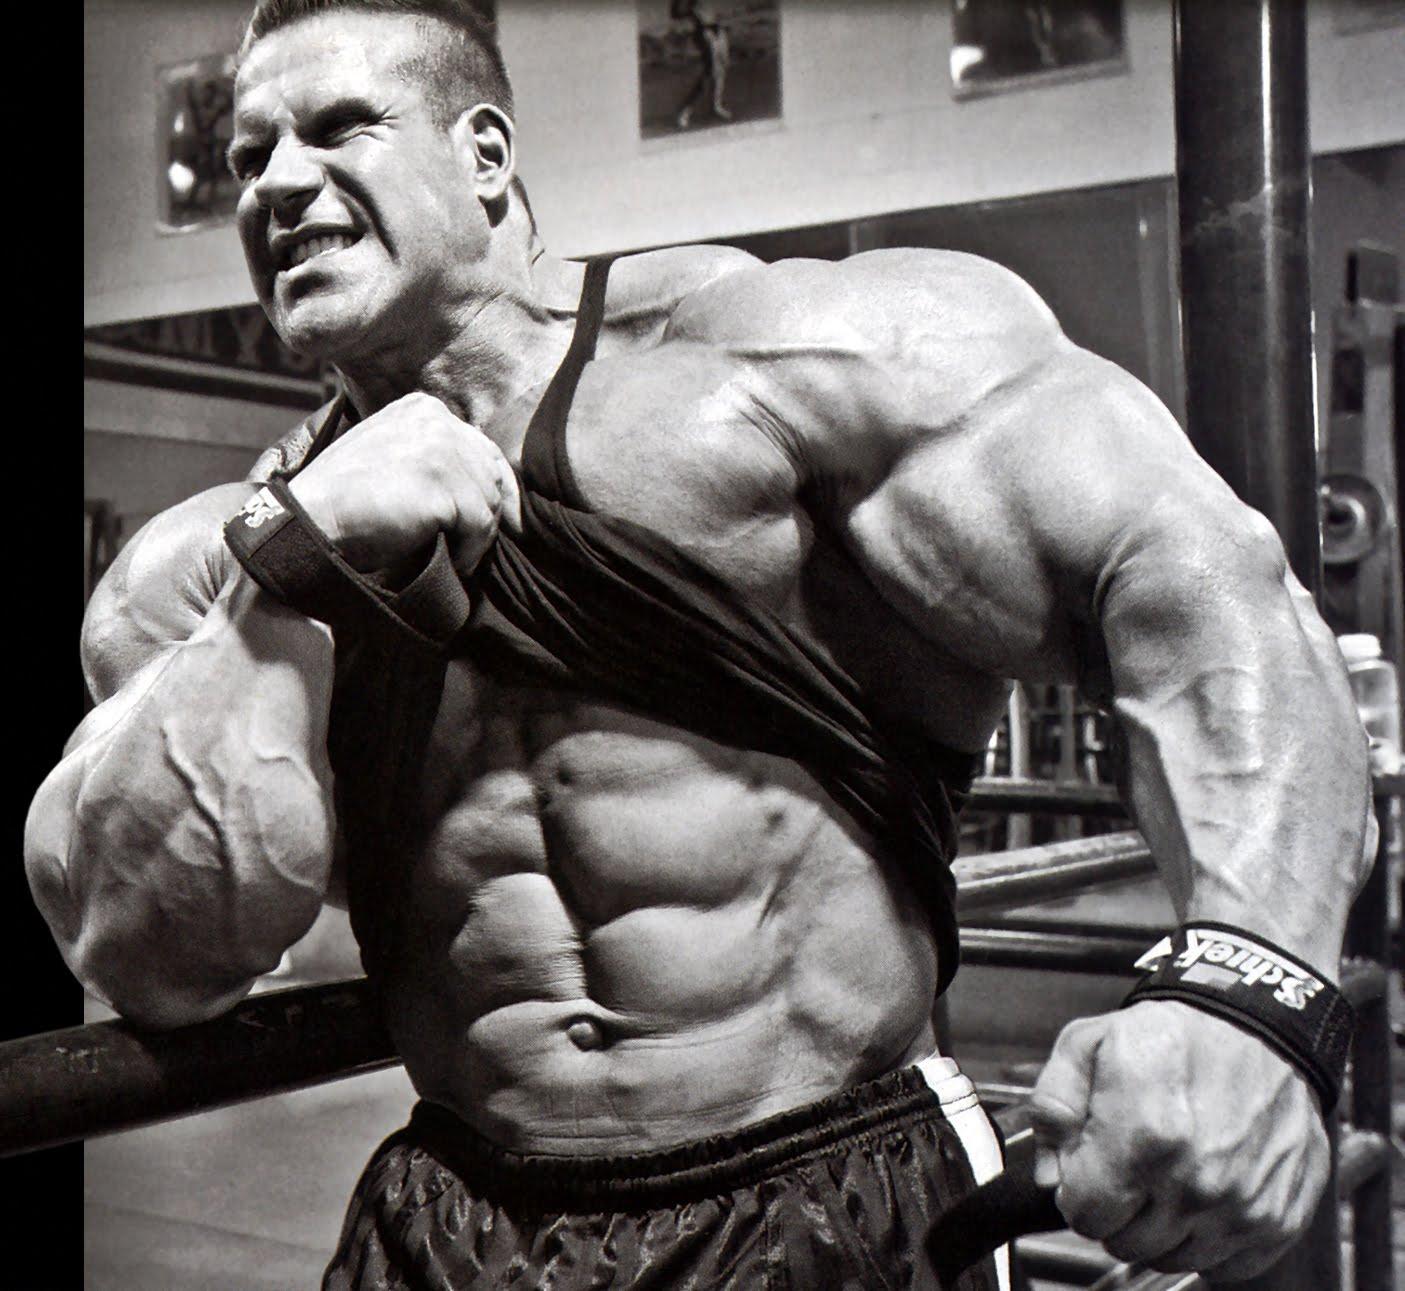 Jay Cutler Bodybuilder Wallpaper